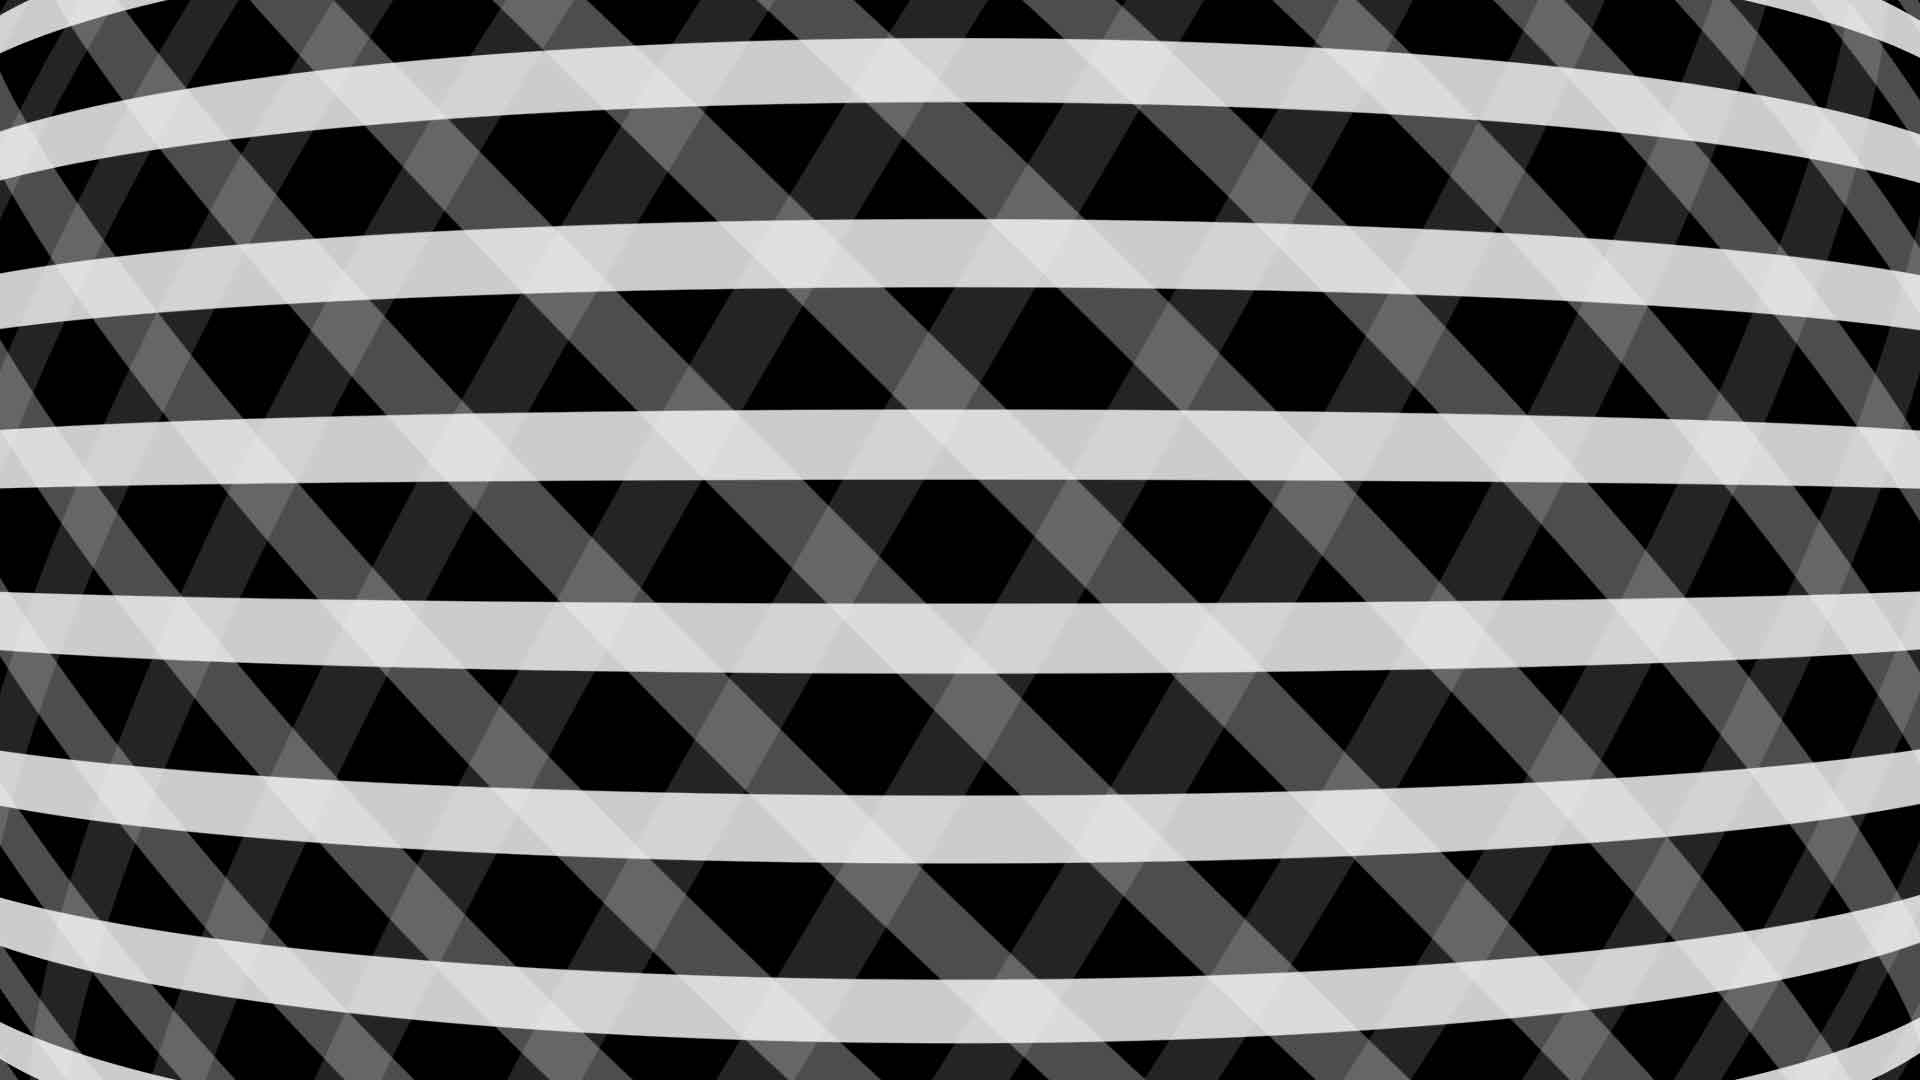 black and white wallpaper 1920x1080